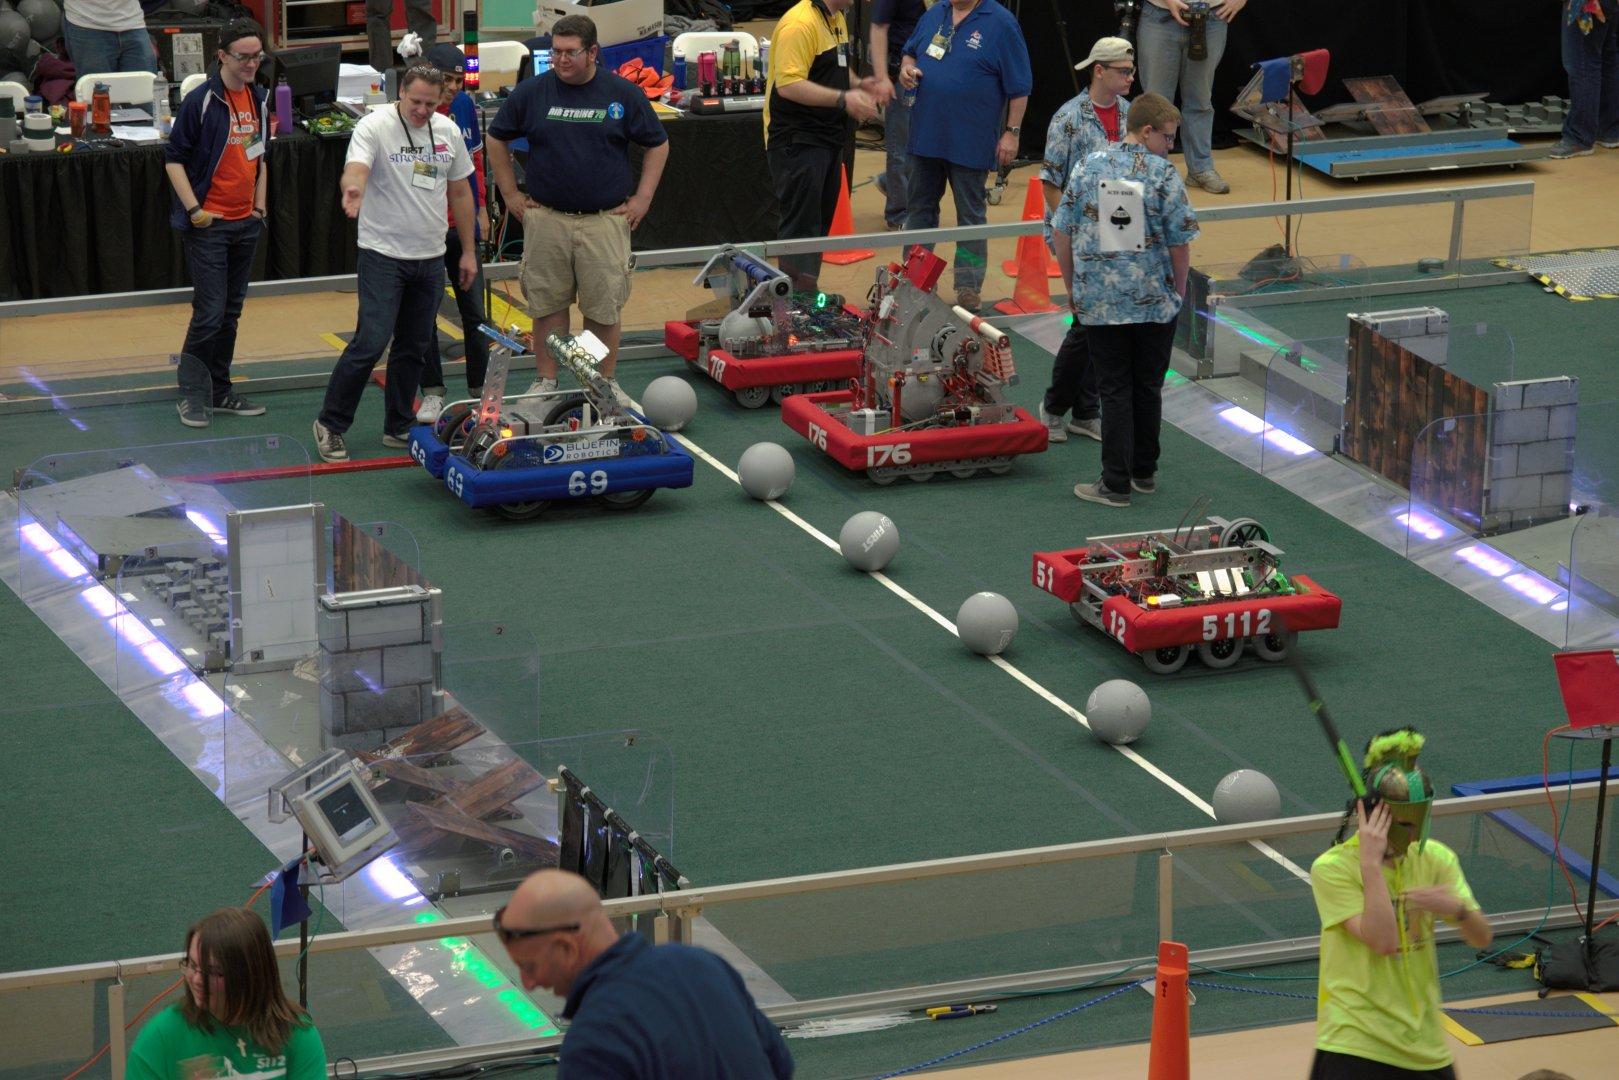 42-FIRST-Robotics-Competition-Umass-Dartmouth-March-18-20.2016-